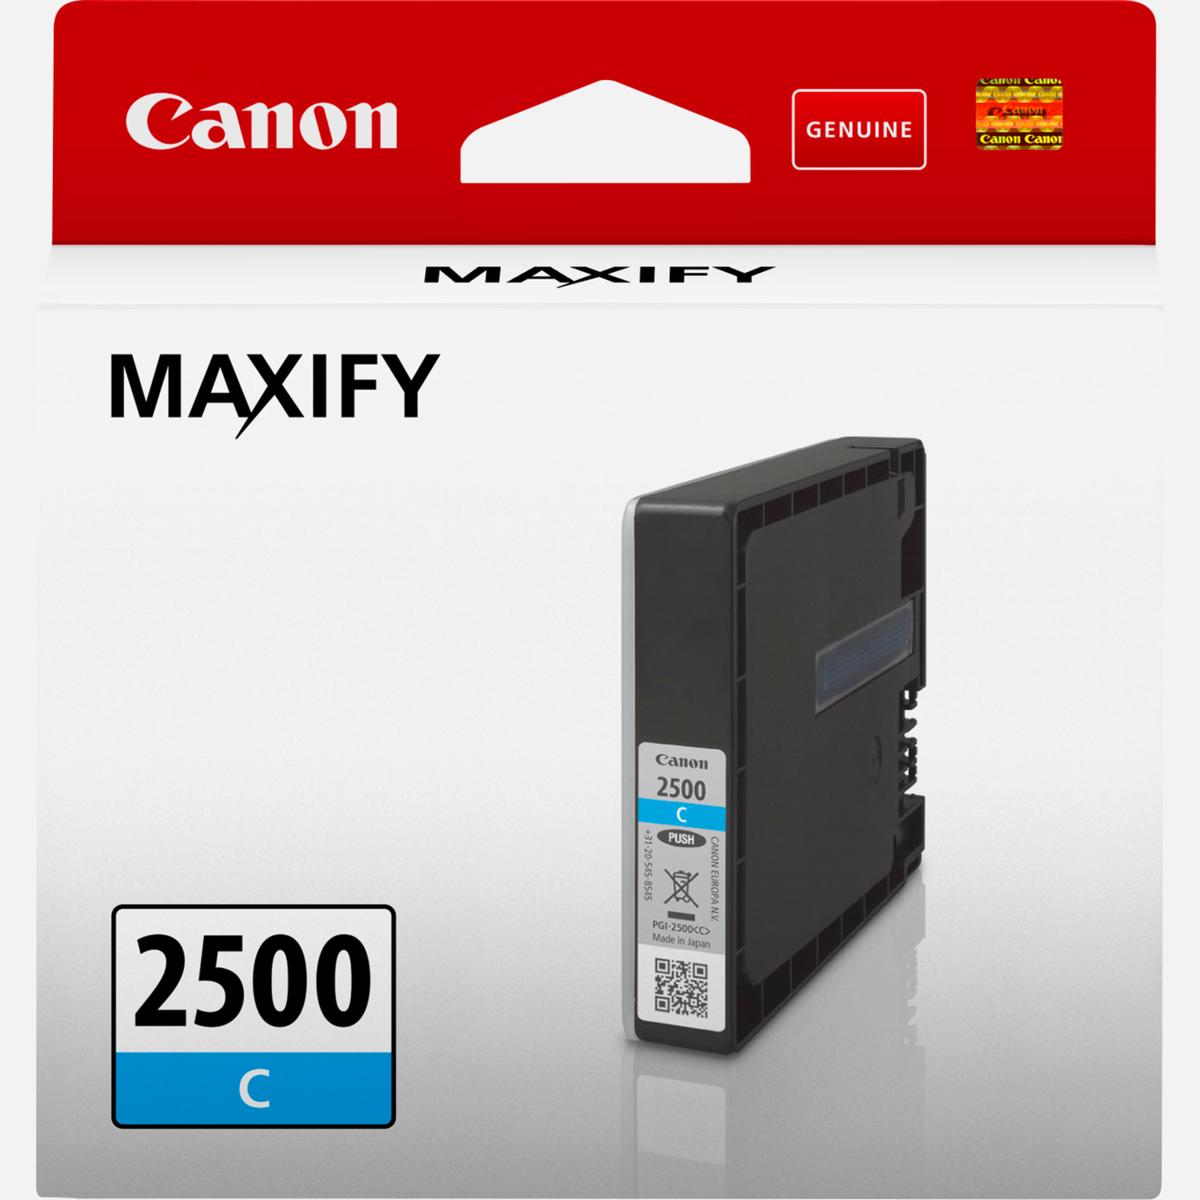 Cartridge Canon PGI-2500 C, 9301B001 - originálny (Azúrová)